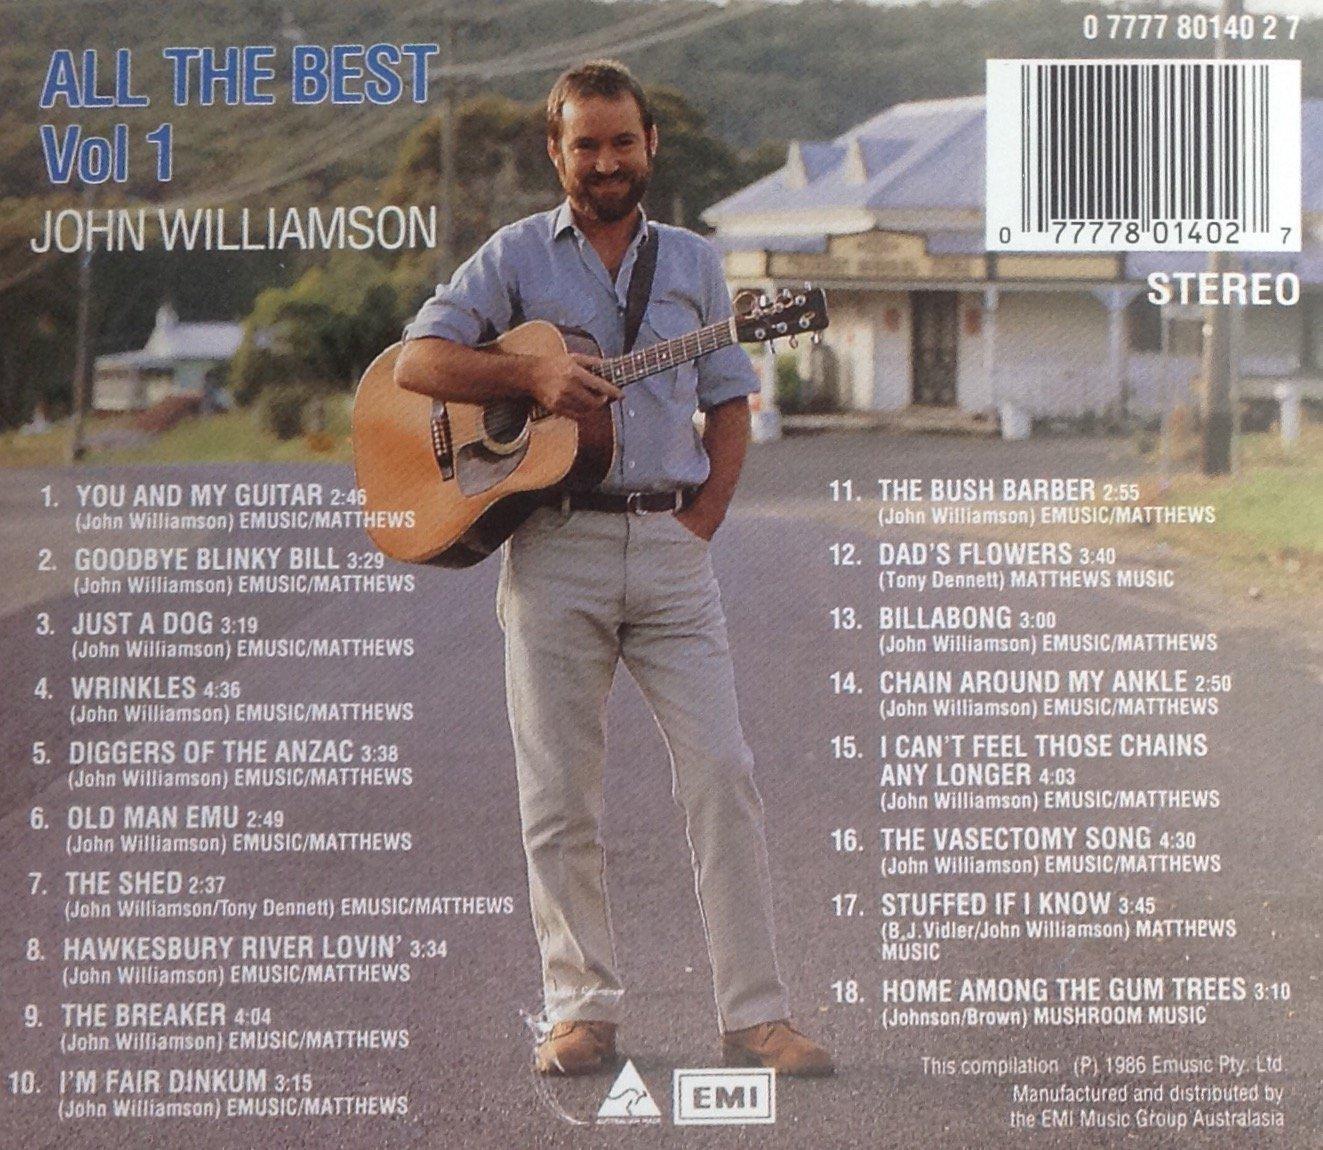 John Williamson All the Best Vol 1 Amazon Music